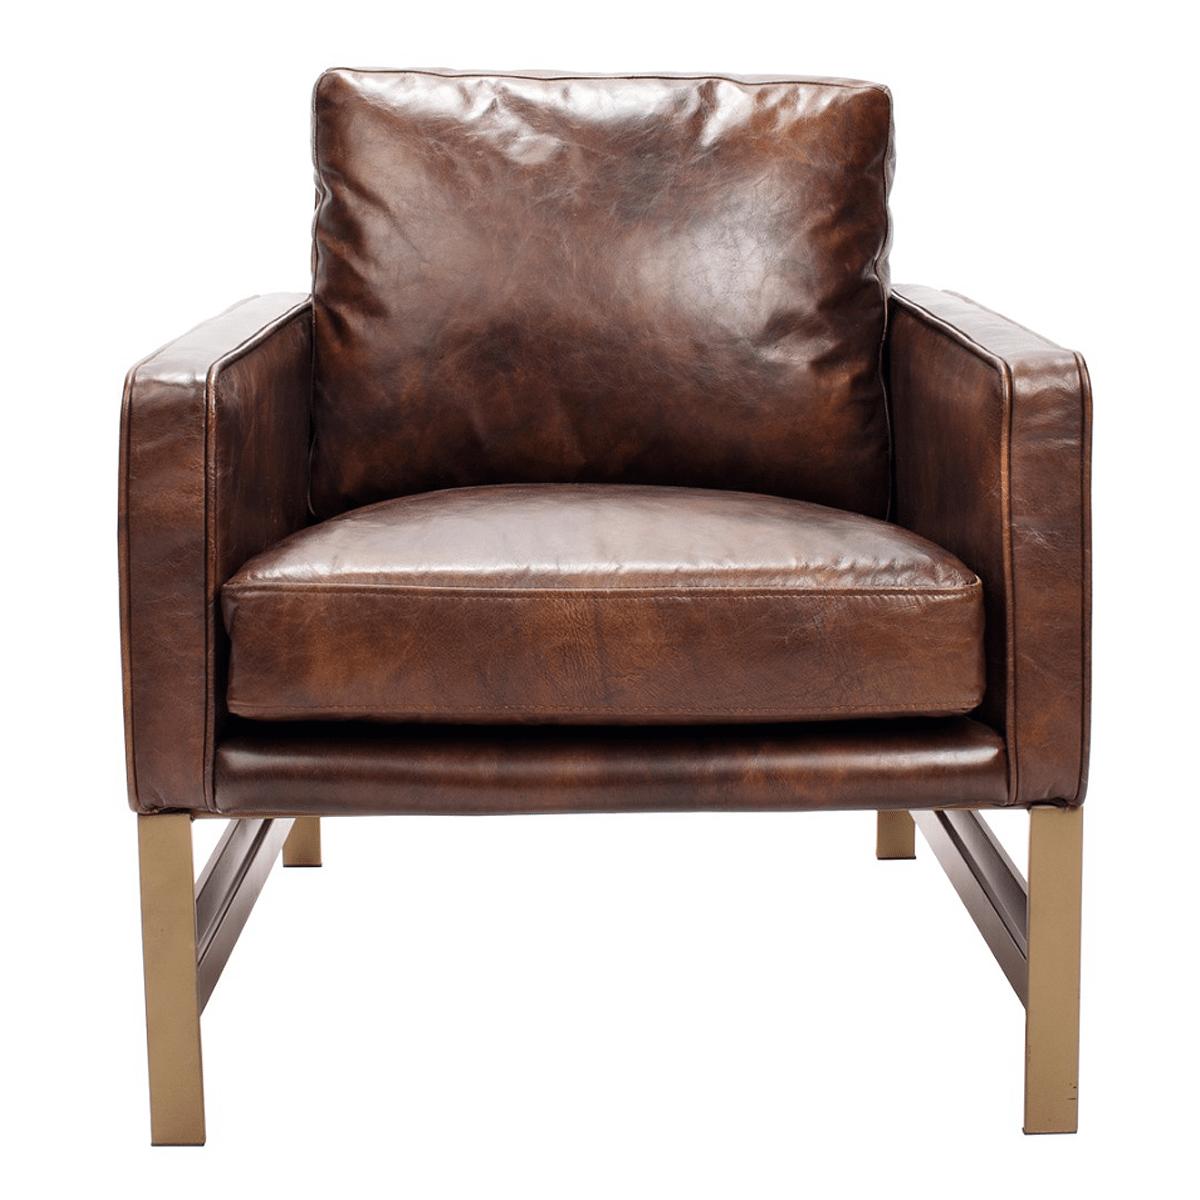 chazzie-club-chair-2-shopceladon